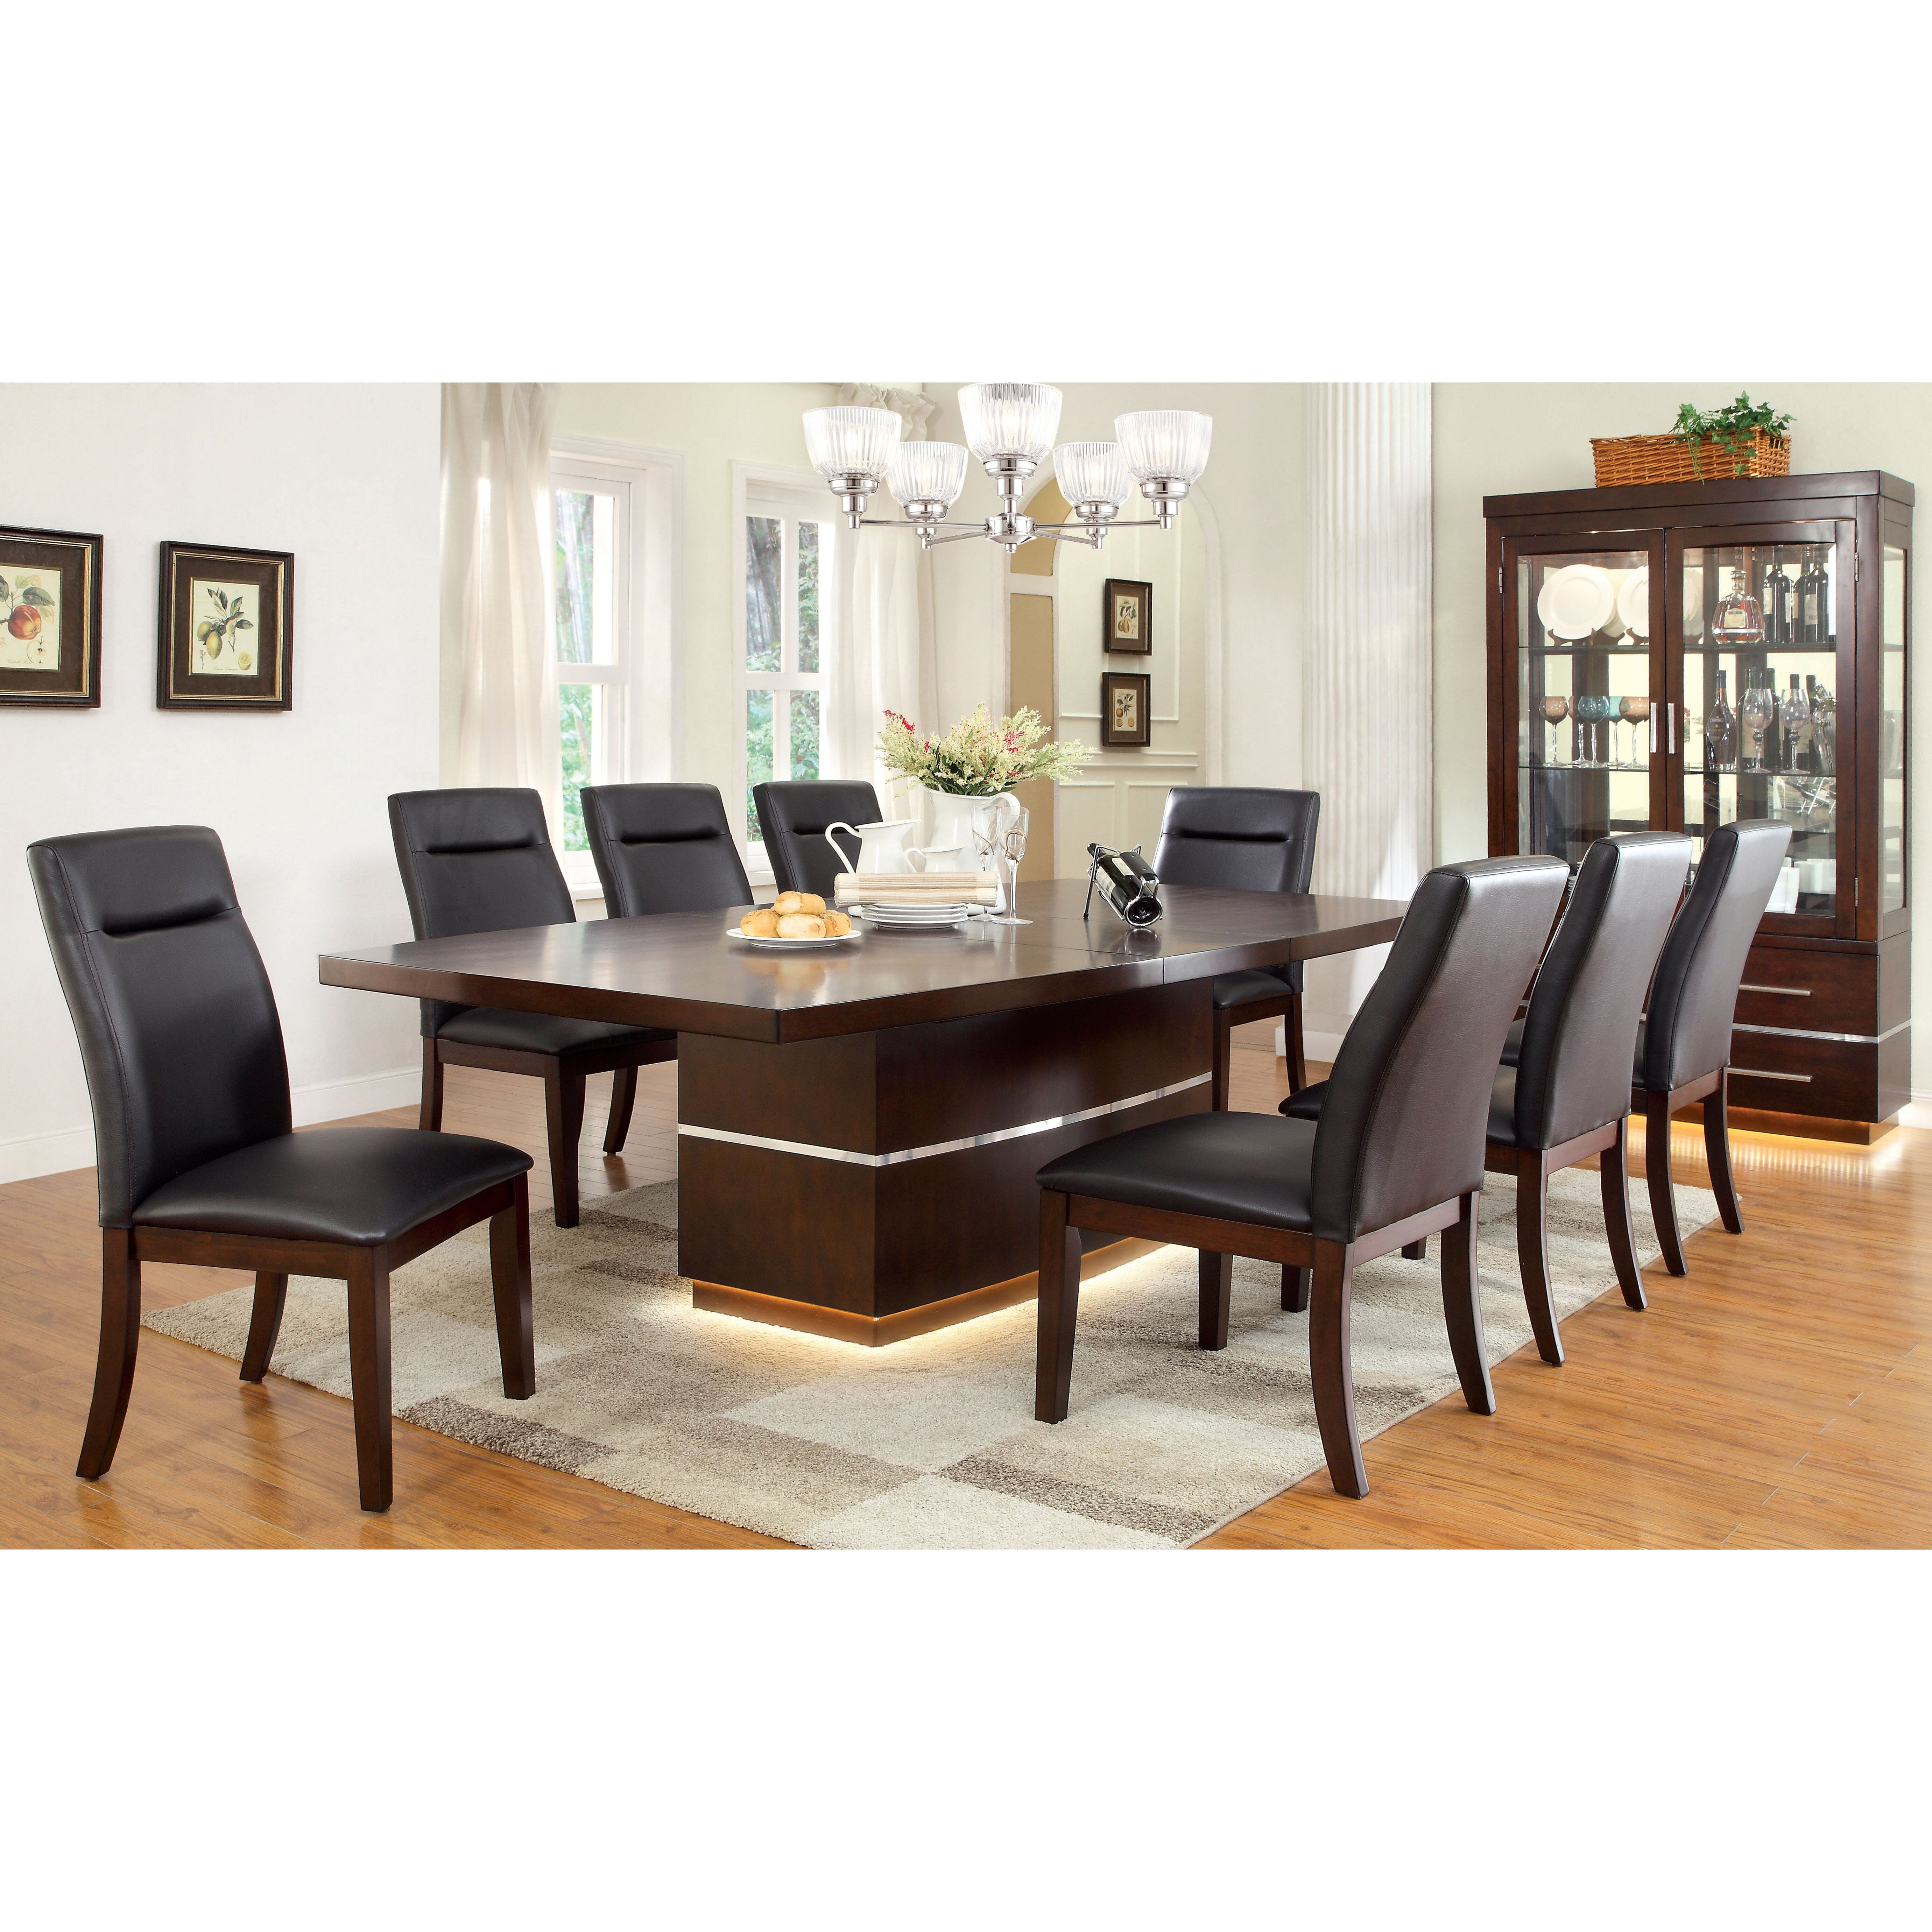 Hokku designs solaare extendable dining table wayfair for Hokku designs dining room furniture